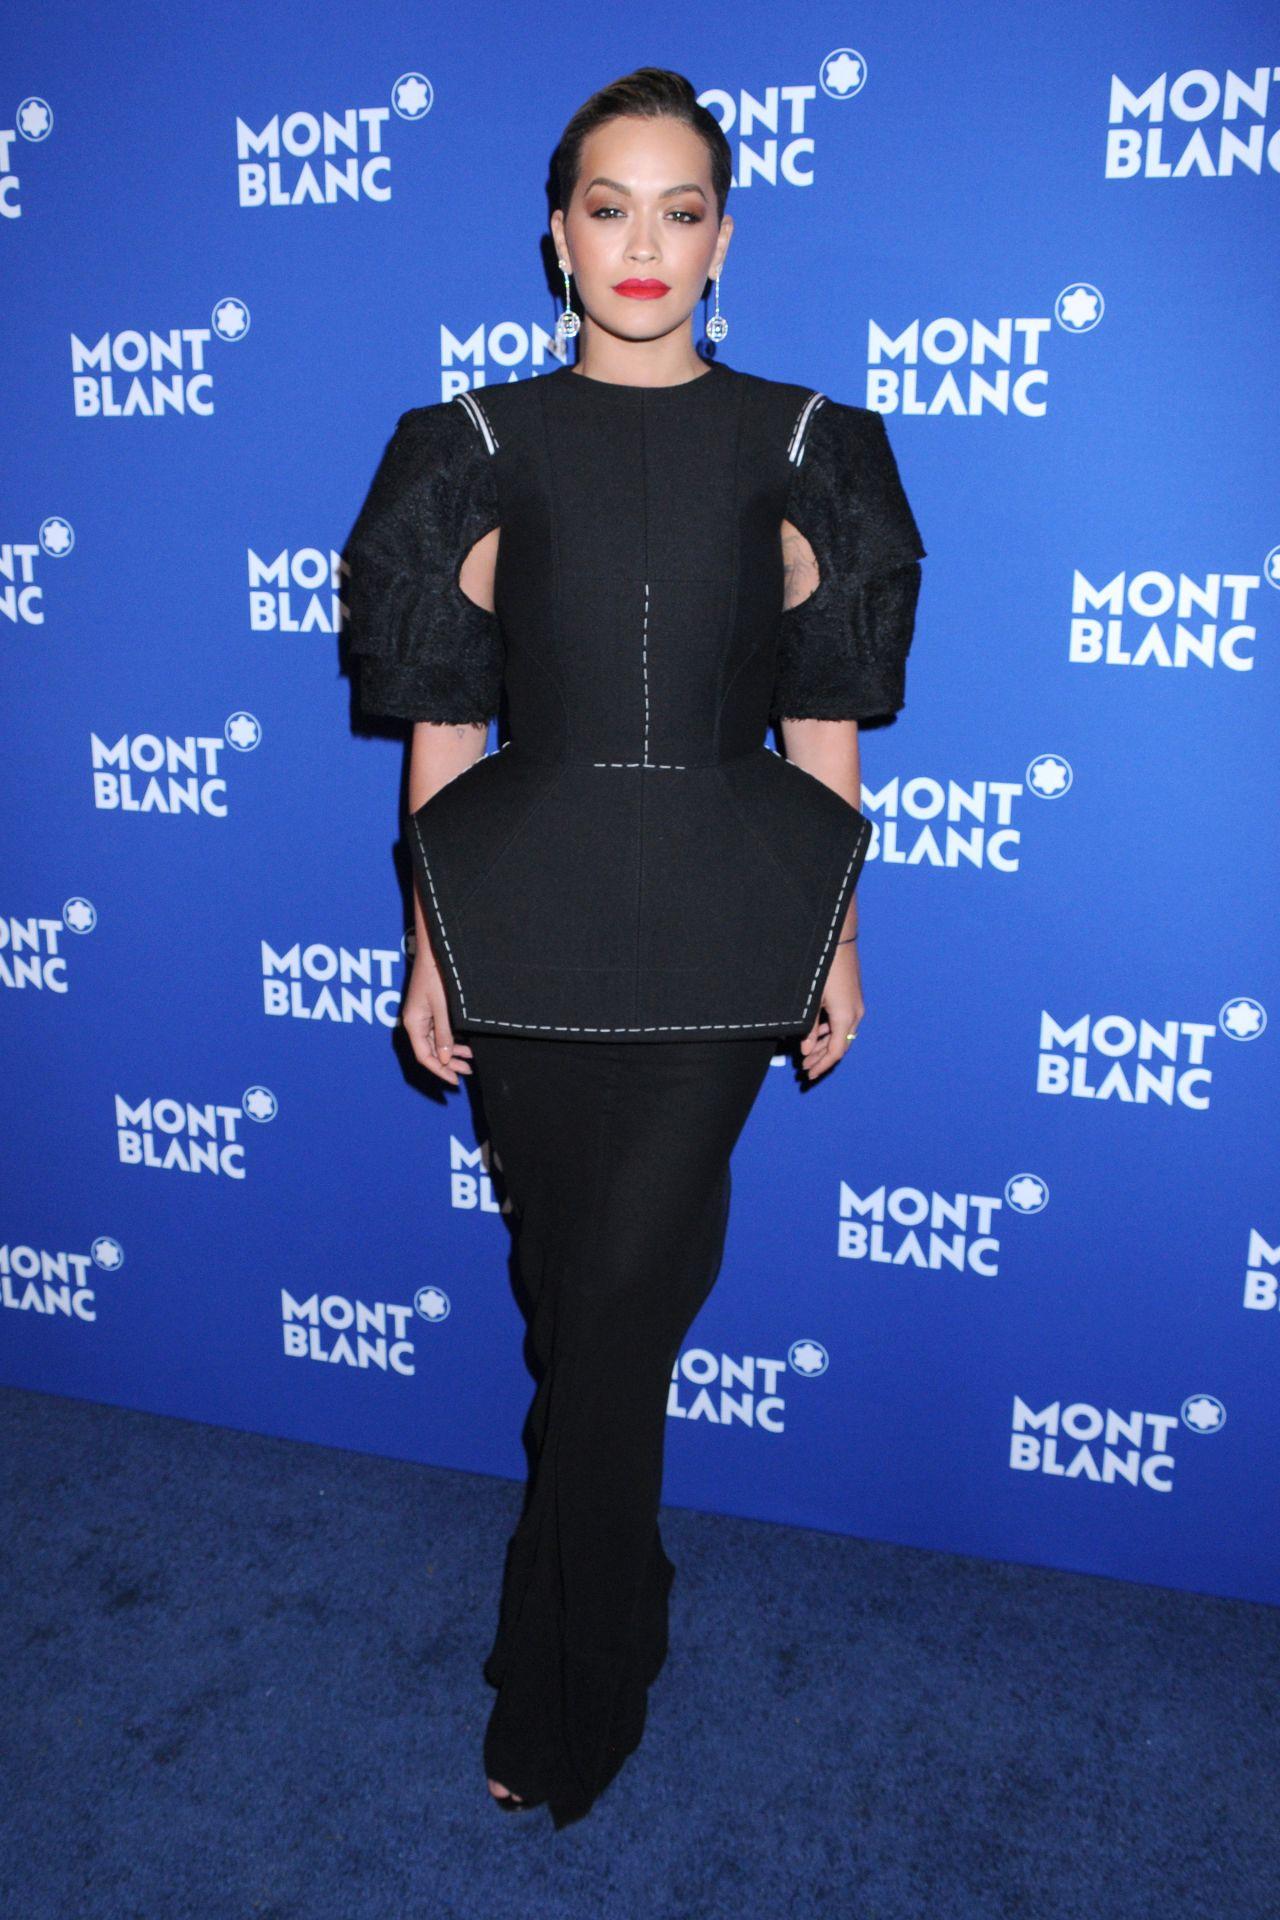 http://celebmafia.com/wp-content/uploads/2018/04/rita-ora-montblanc-celebrates-le-petit-in-new-york-12.jpg